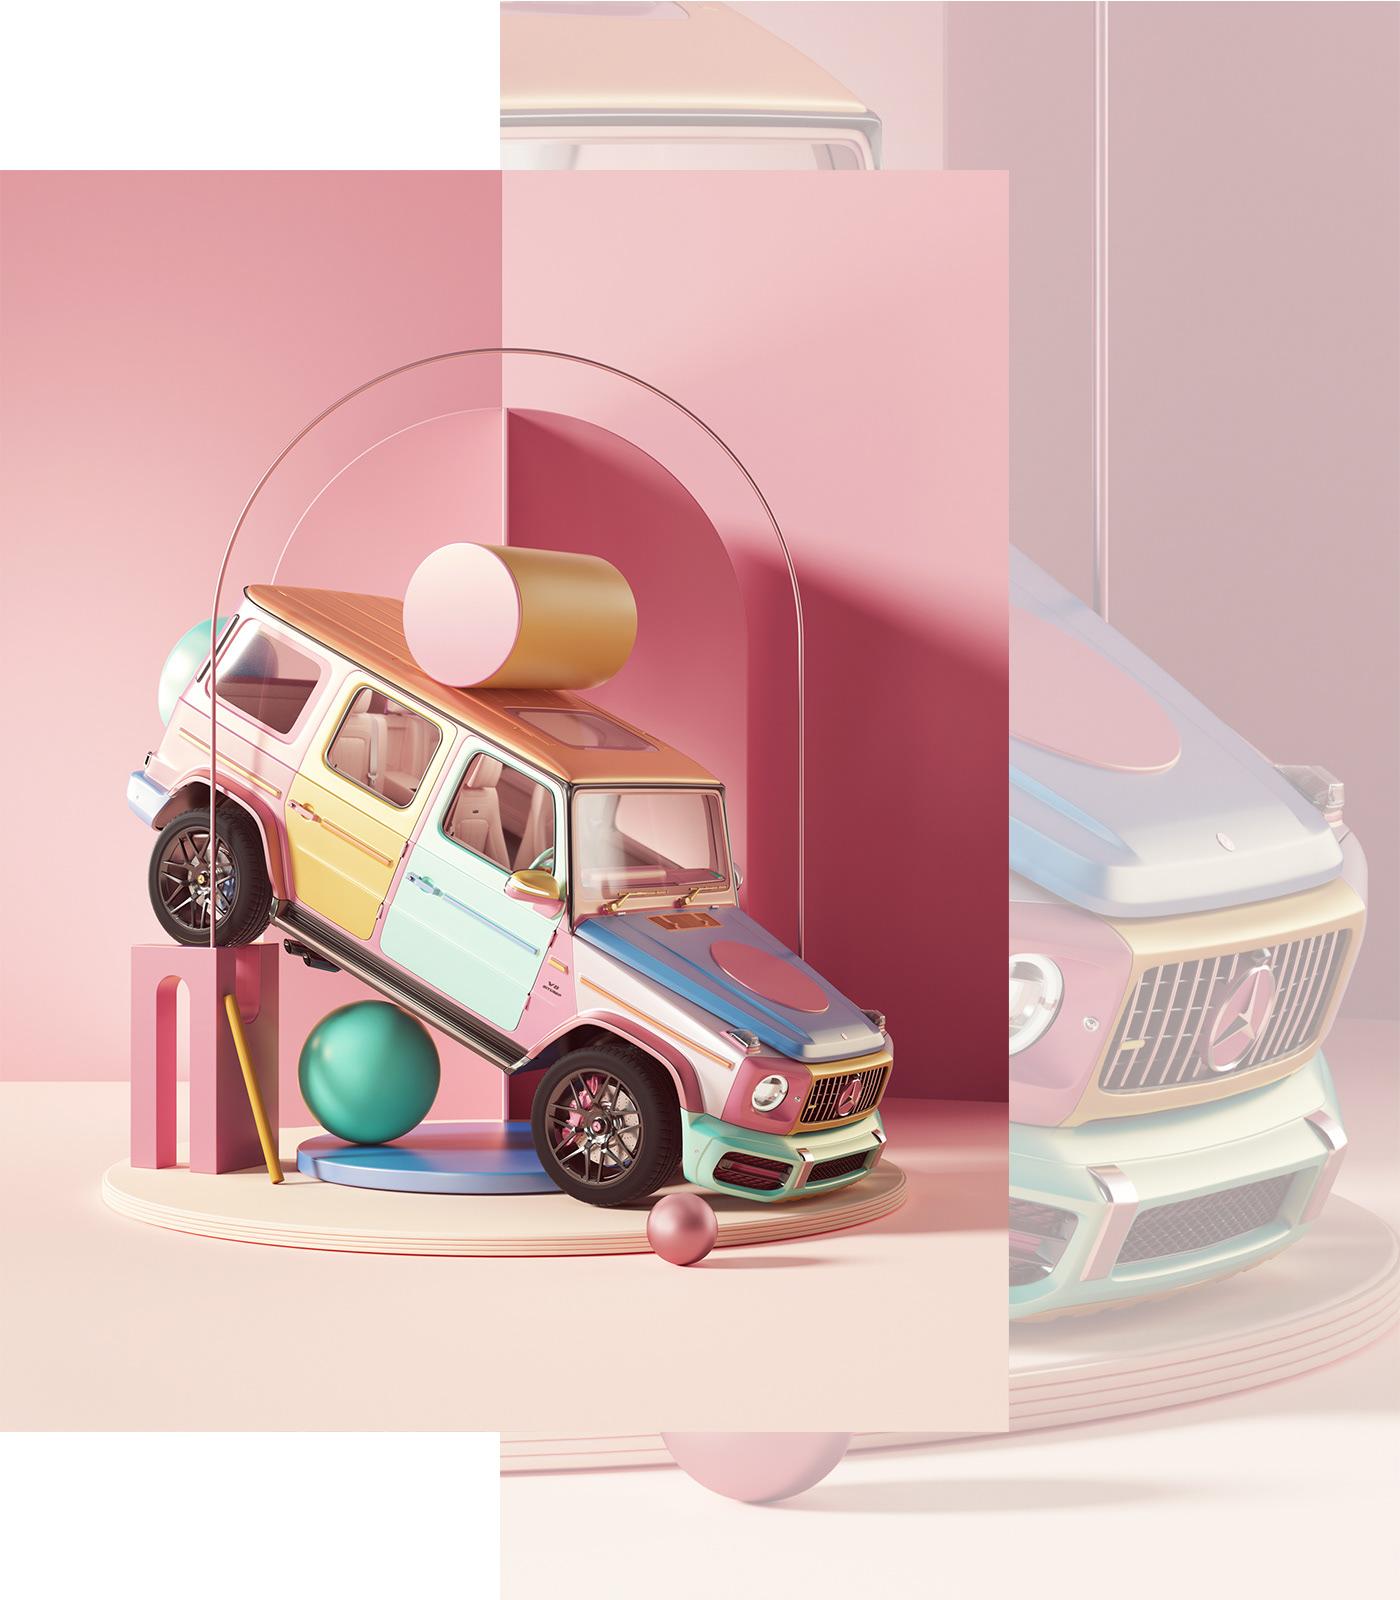 3D art automotive   c4d cinema4d instagram octane petetarka Render setdesign